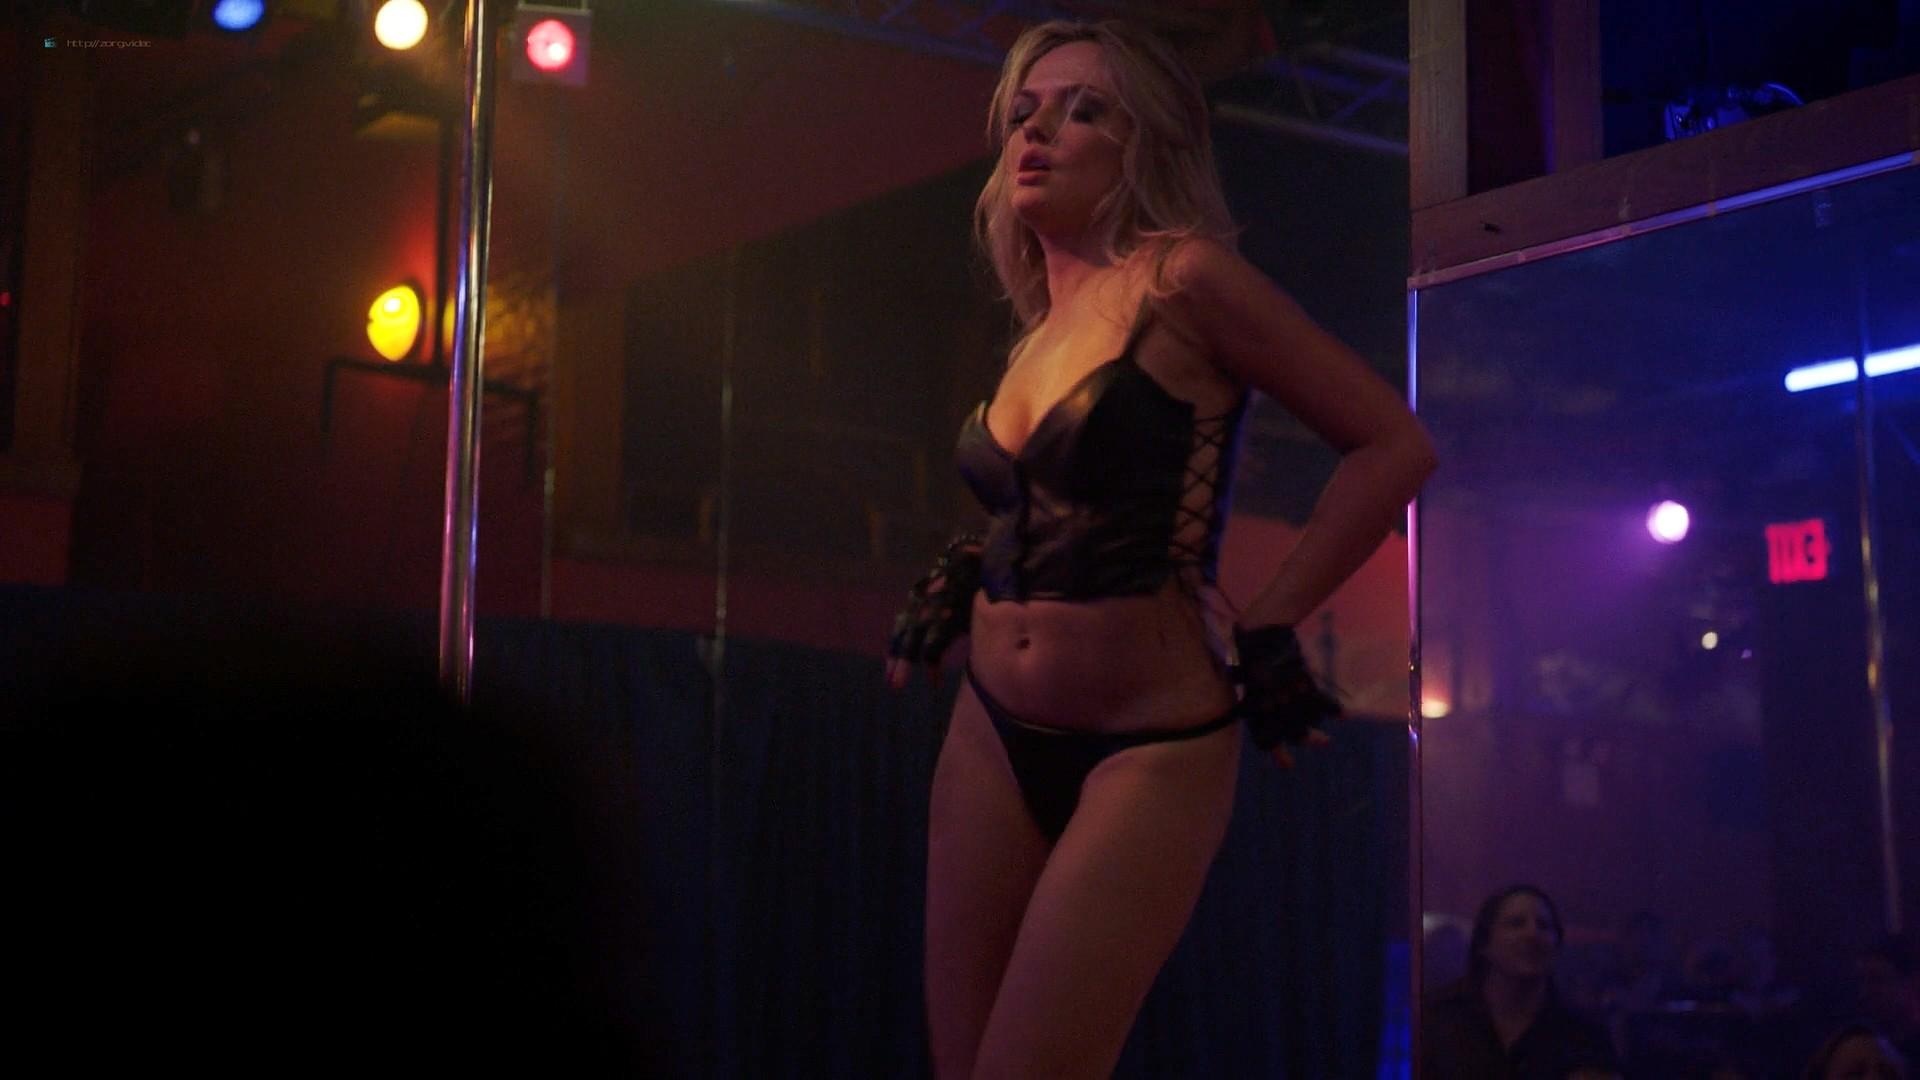 0909091421940_03_Emily-Meade-nude-topless-Samantha-Steinmetz-topless-too-The-Deuce-2019-s3e5-1080p-009.jpg